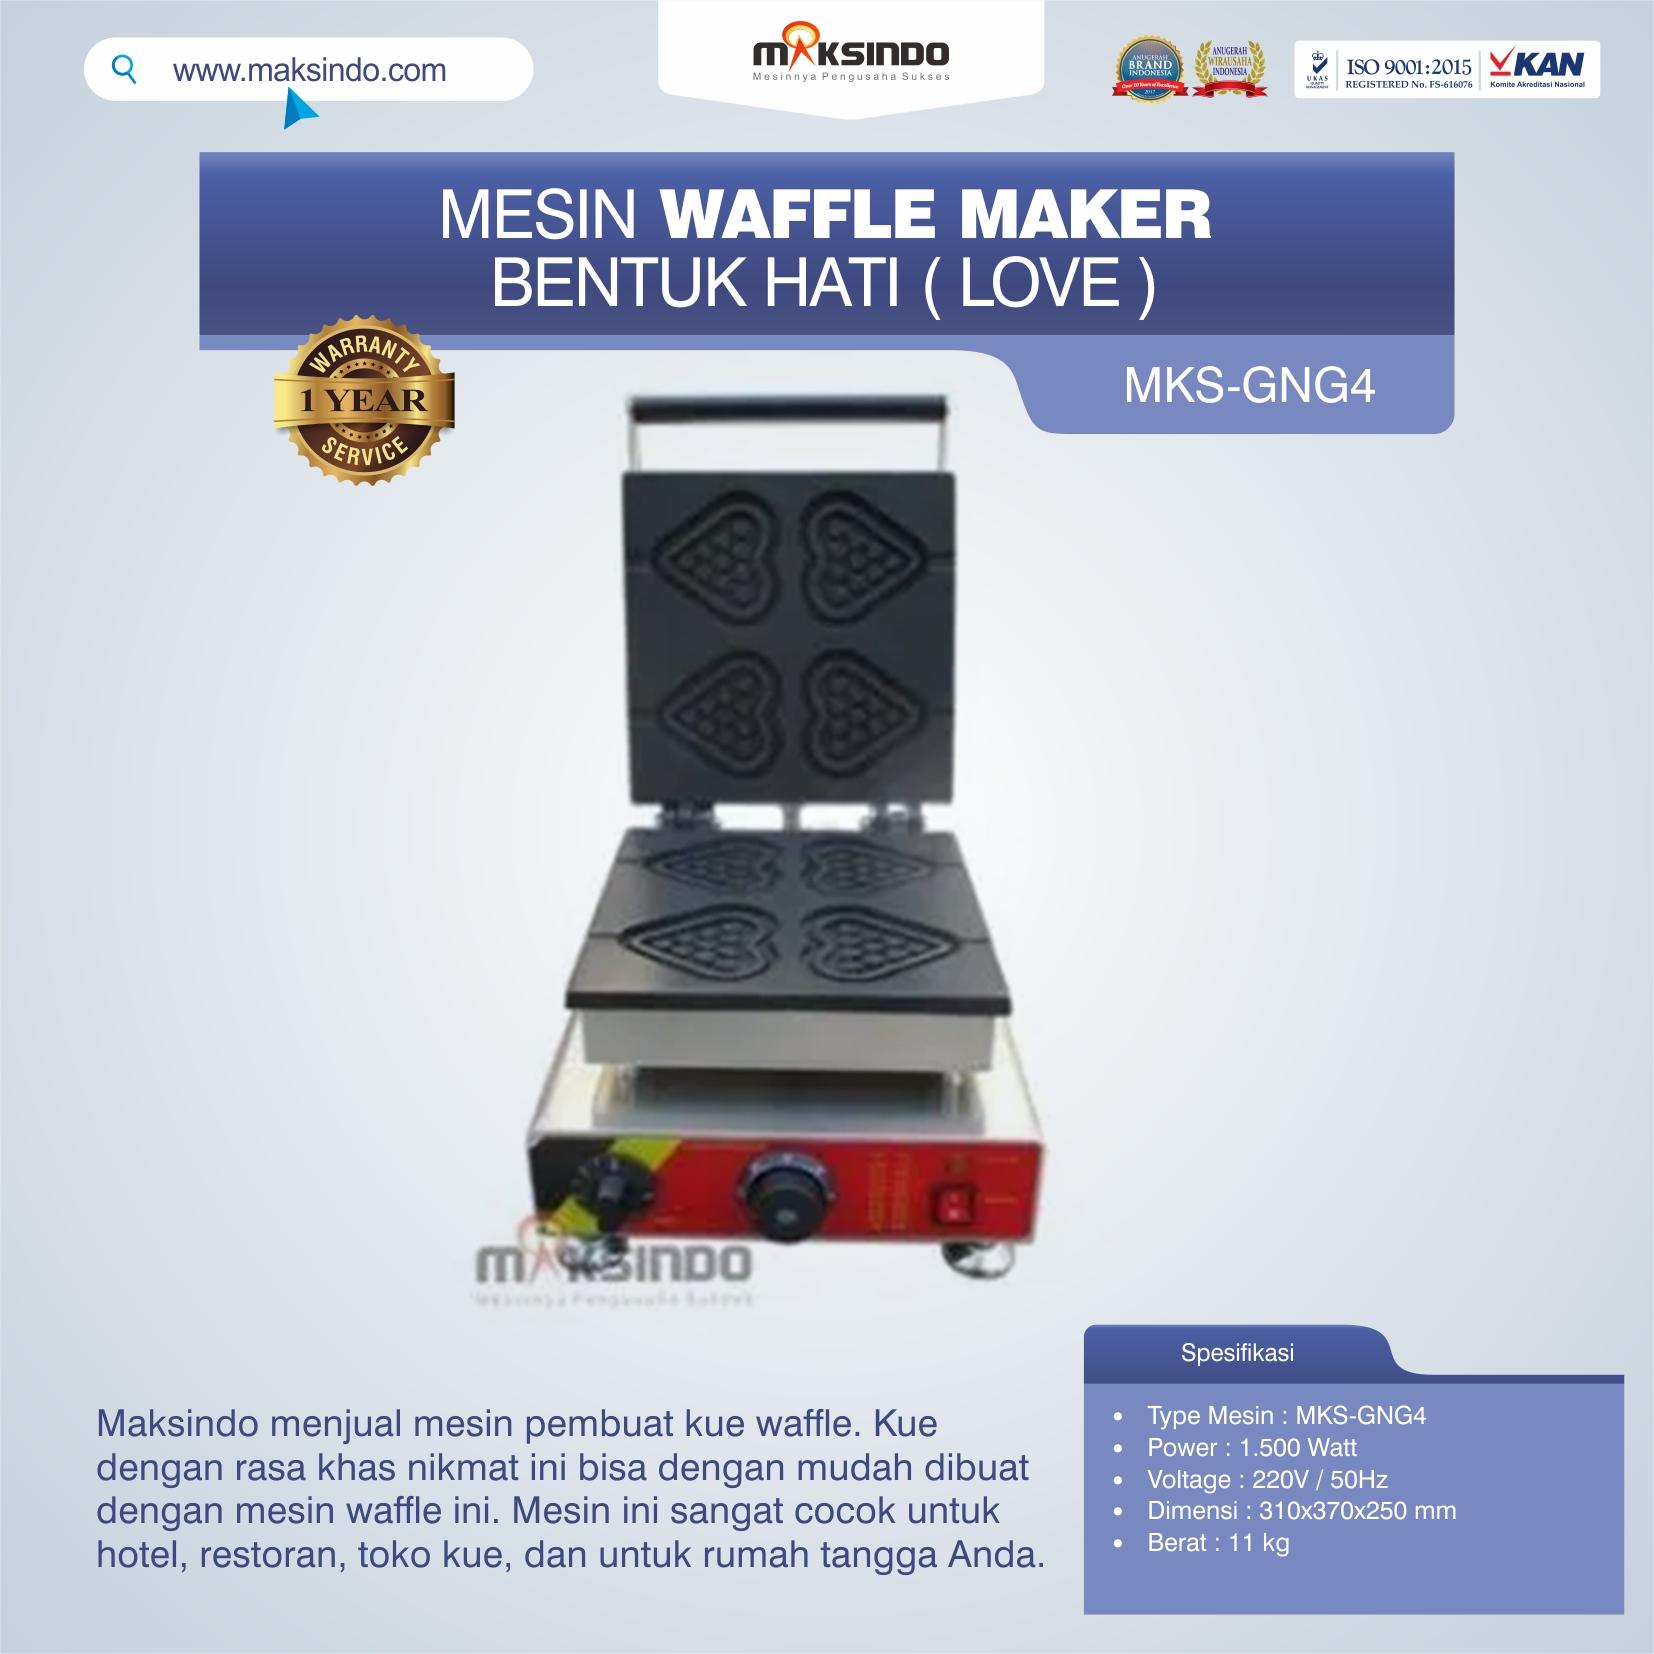 Jual Mesin Waffle Maker Bentuk Hati (Love) MKS-GNG4 di Medan